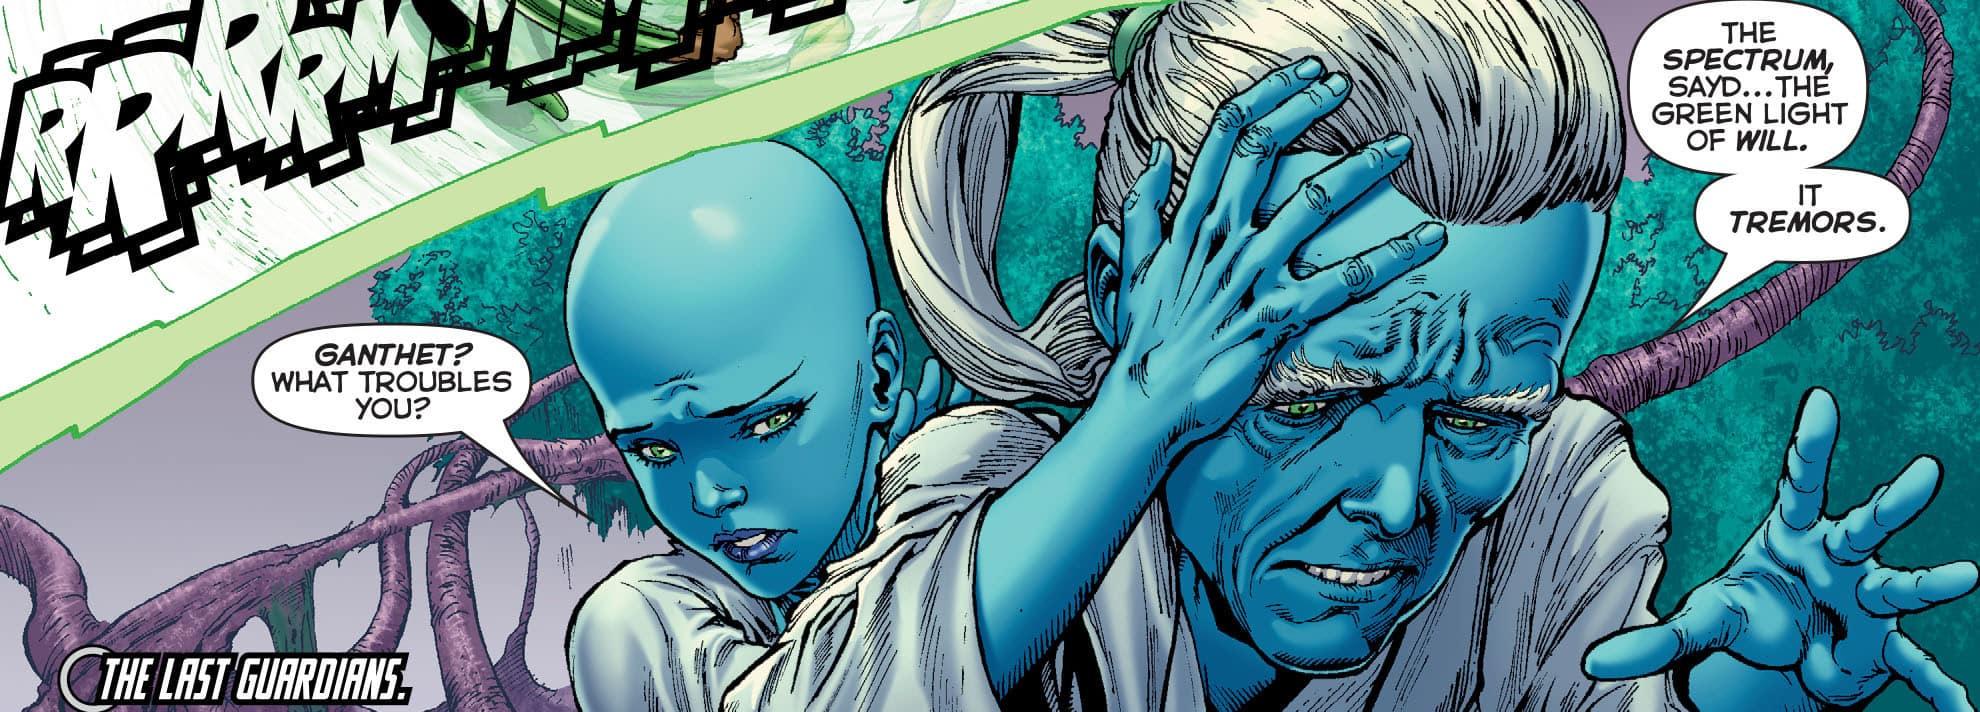 Hal-Jordan-and-the-Green-Lantern-Corps-Rebirth-12-spoilers-4-min